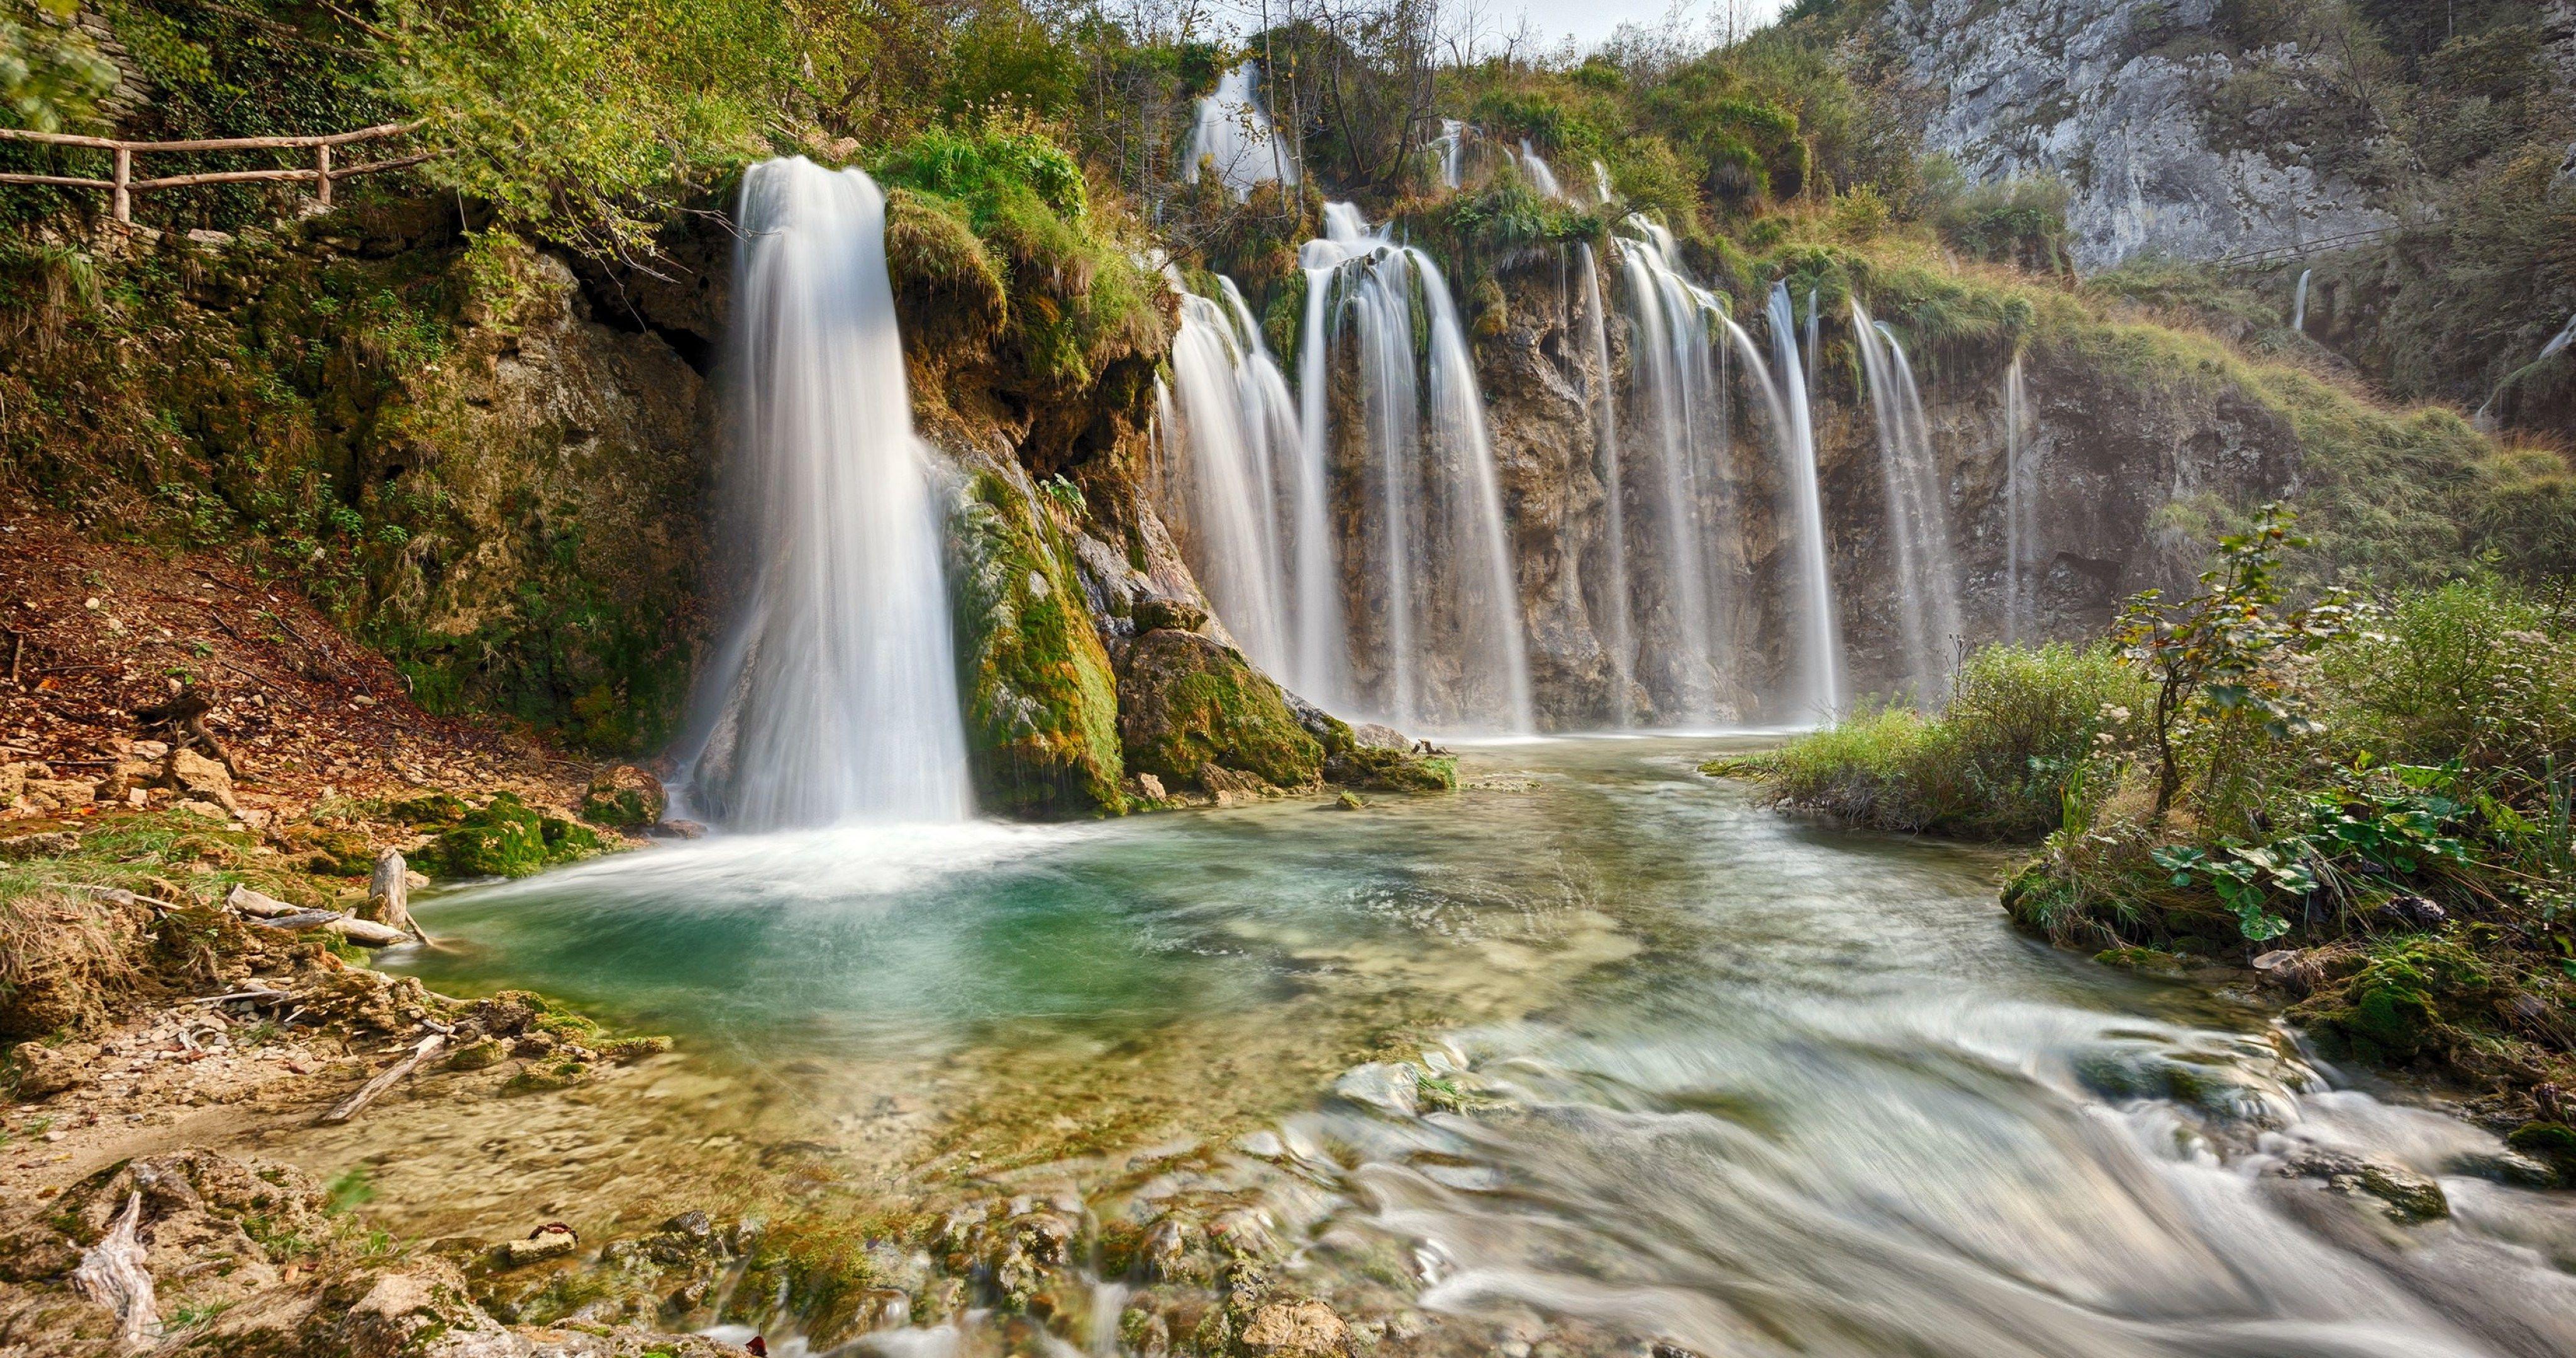 plitvice national park 4k ultra hd wallpaper Waterfall